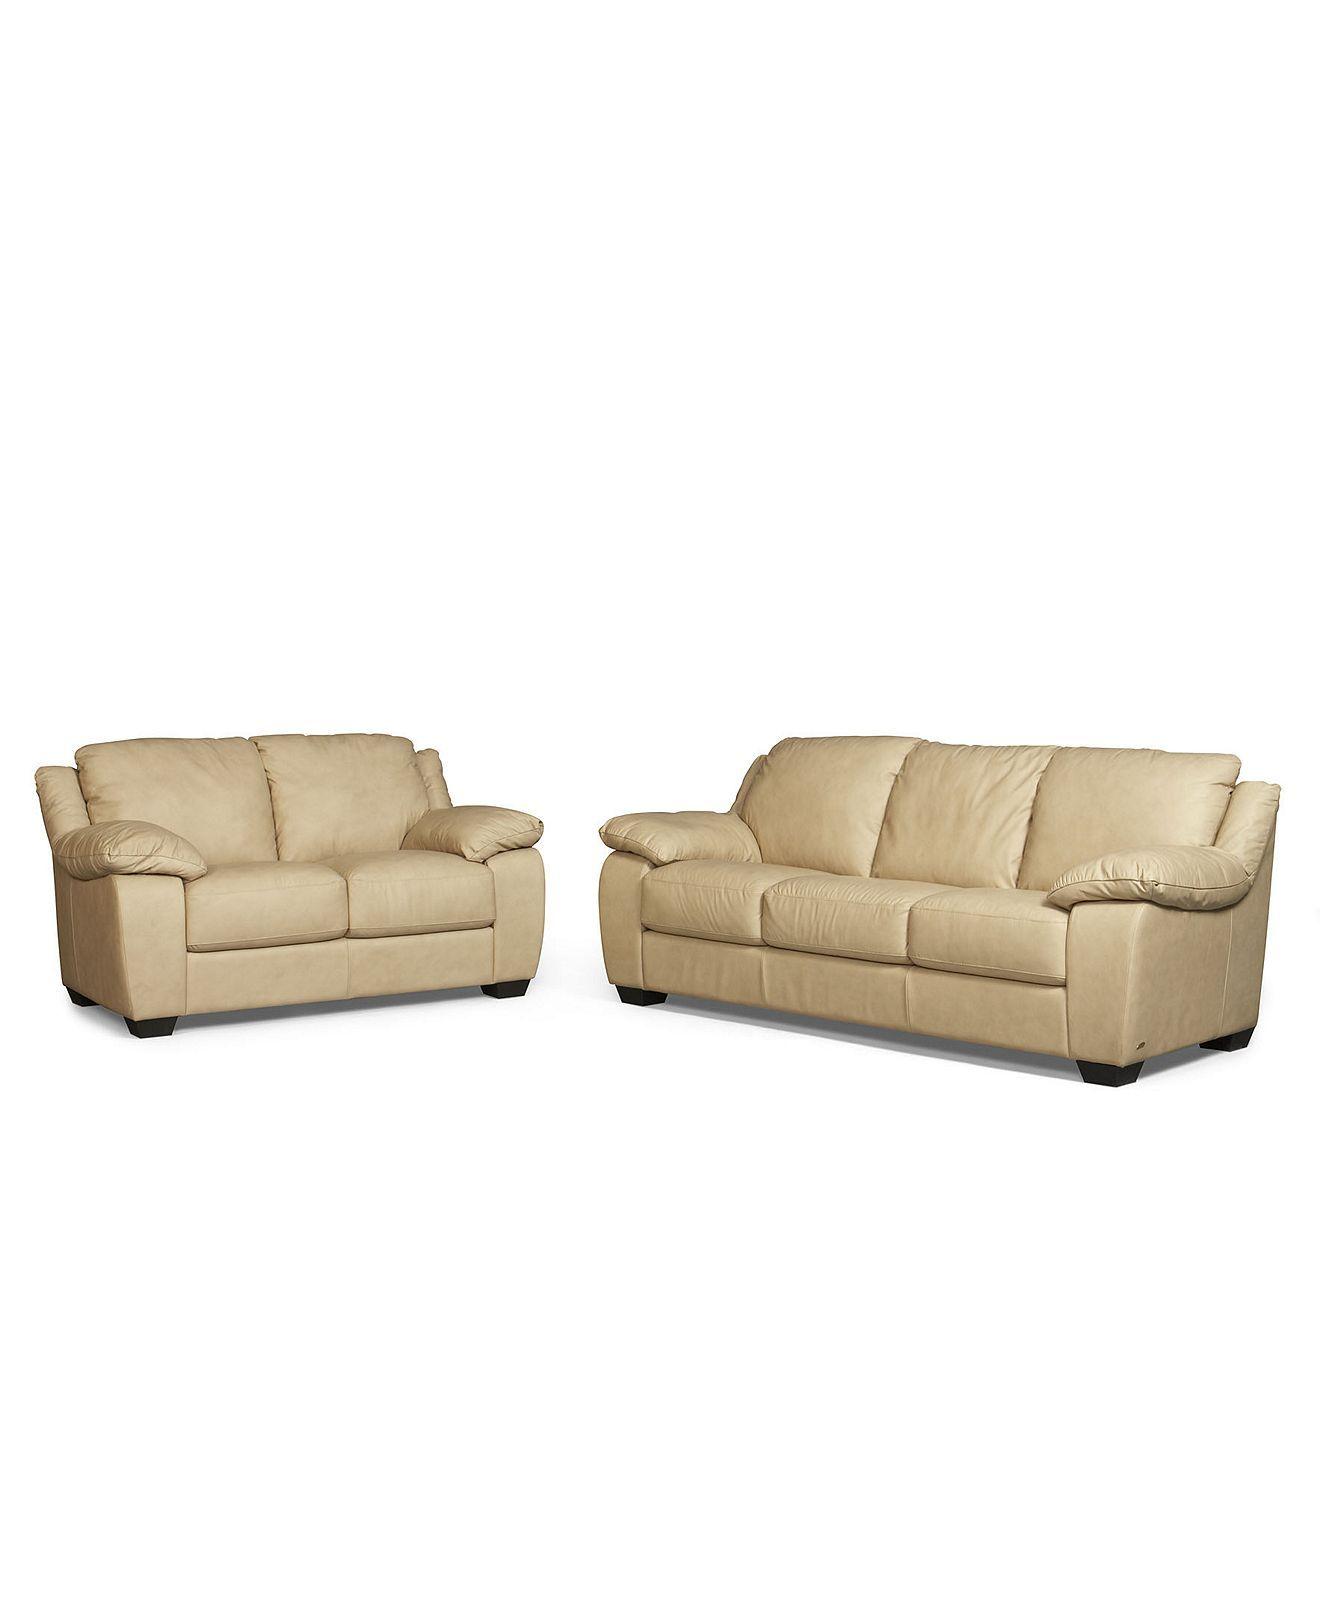 Blair 2 Piece Leather Sofa Set